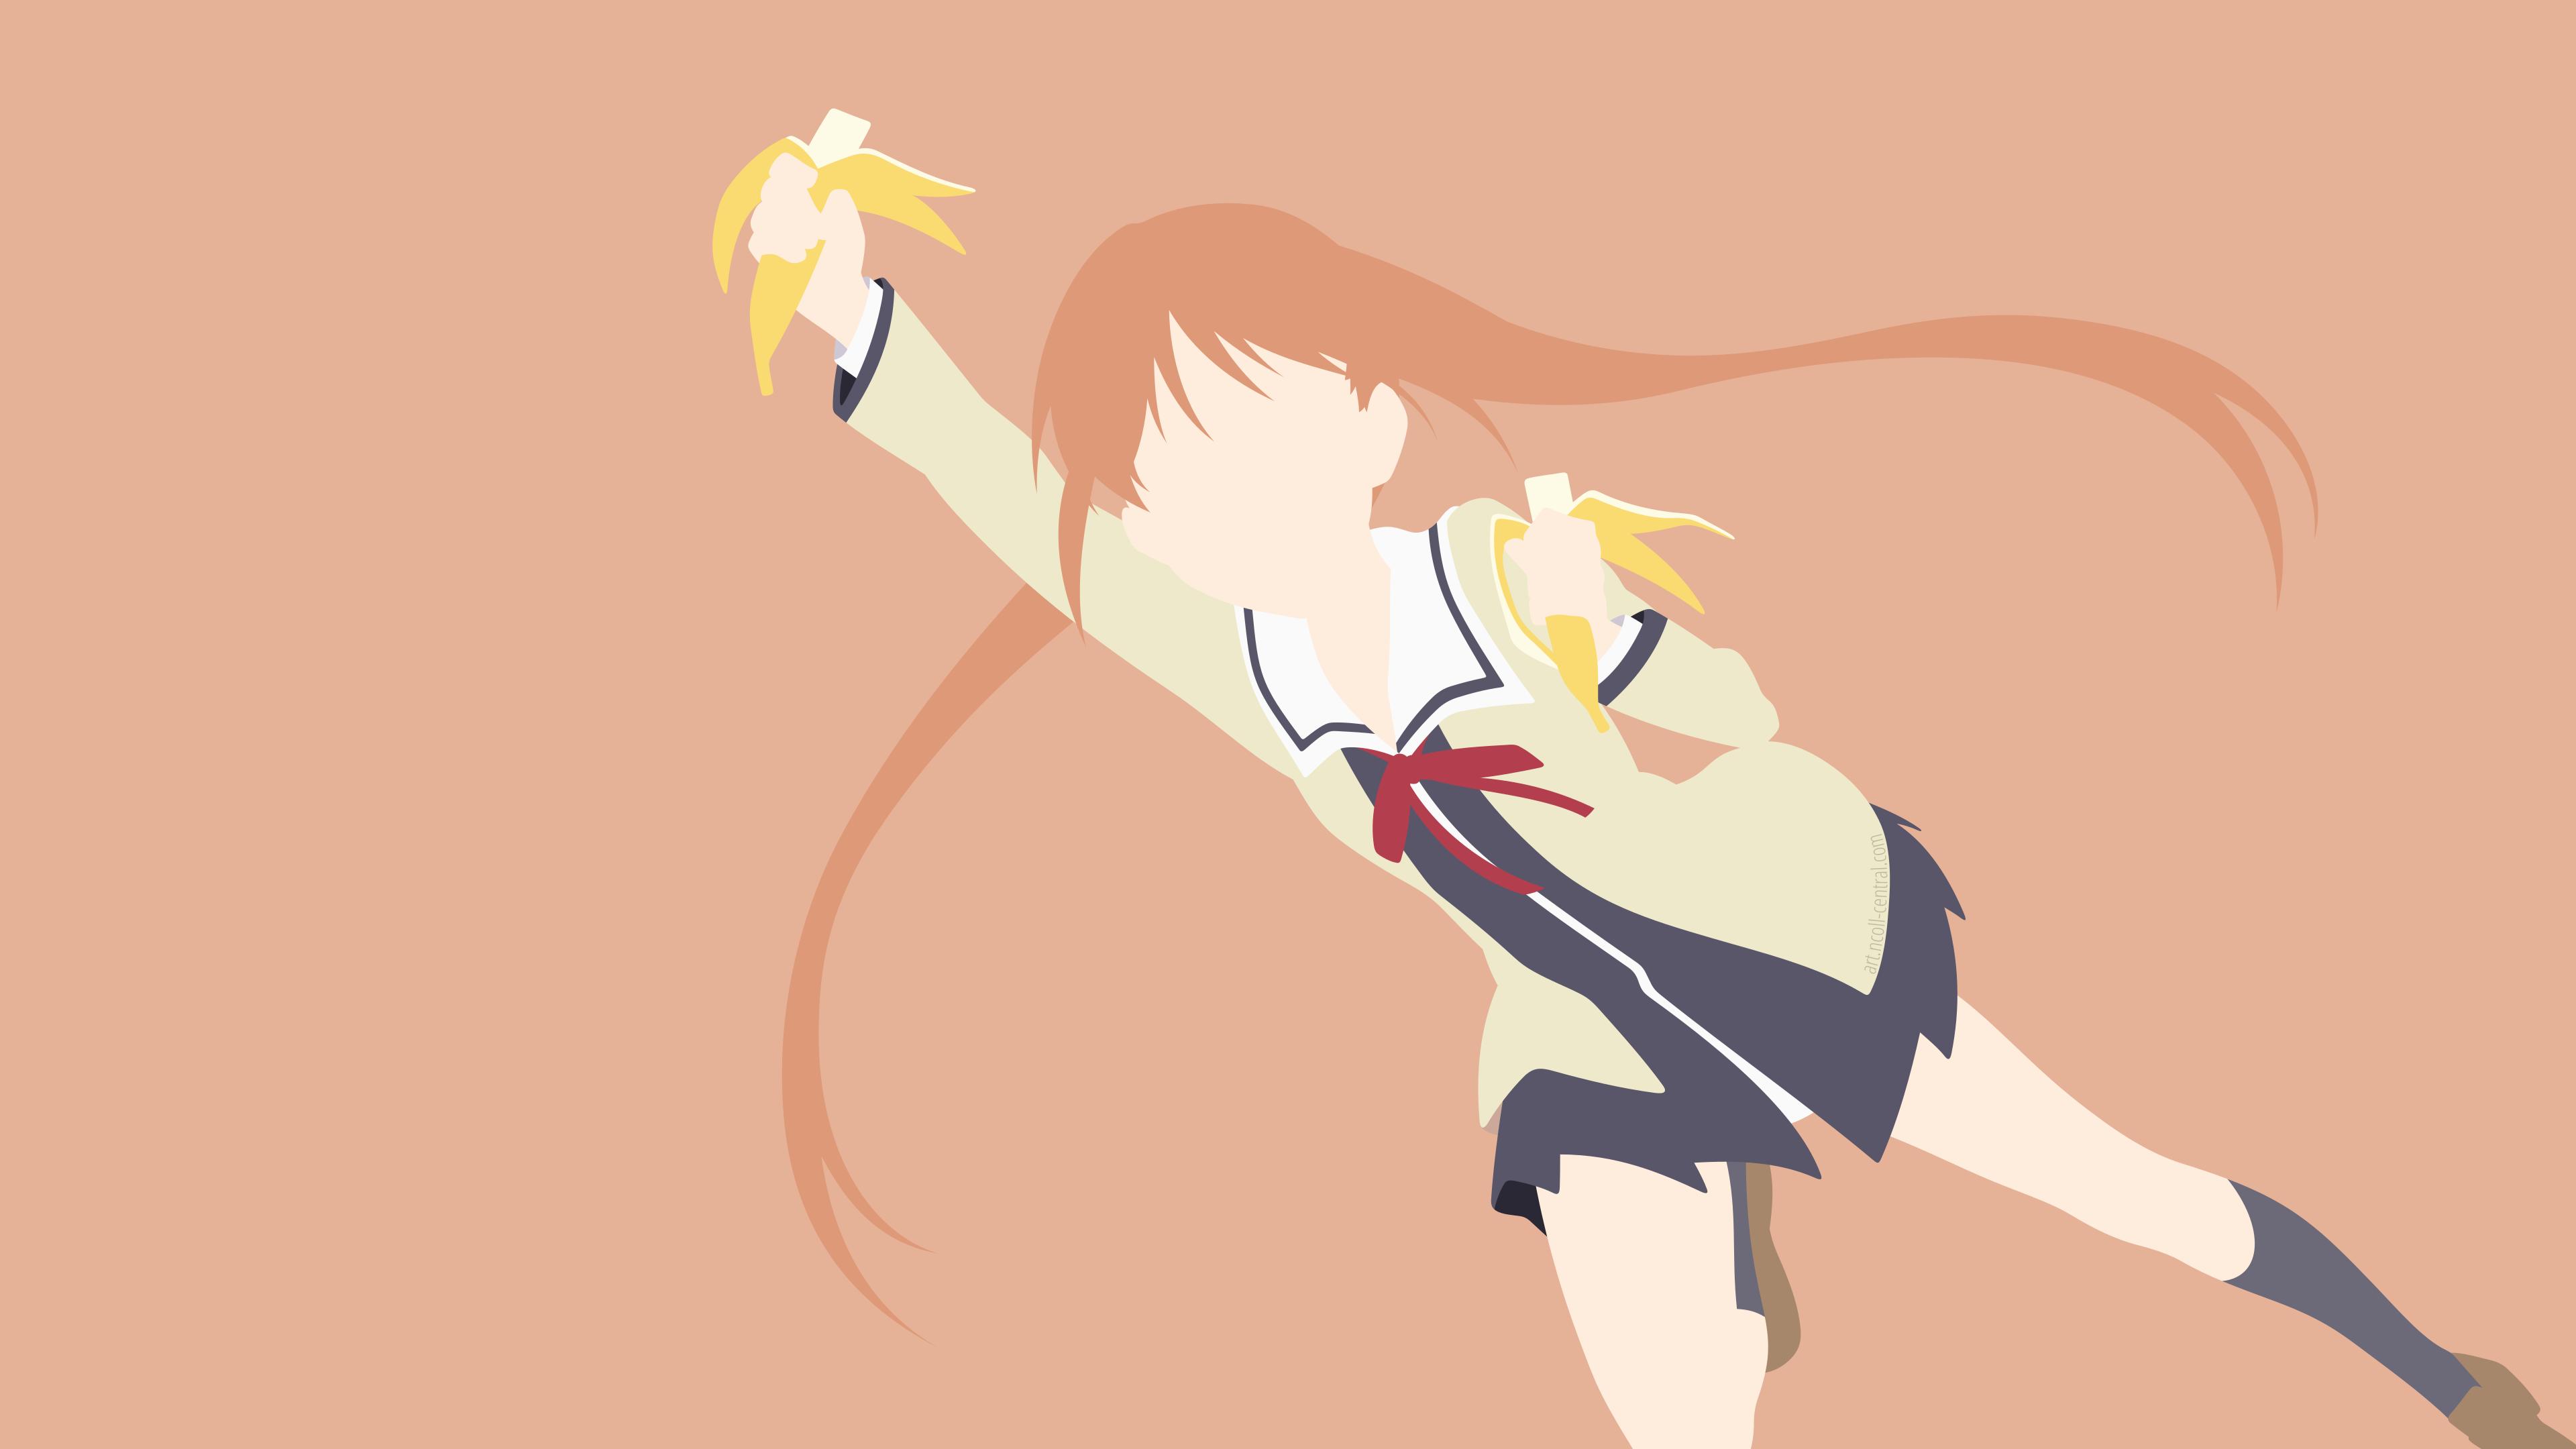 Anime 3840x2160 AHO-GIRL Hanabatake Yoshiko bananas minimalism simple background anime girls